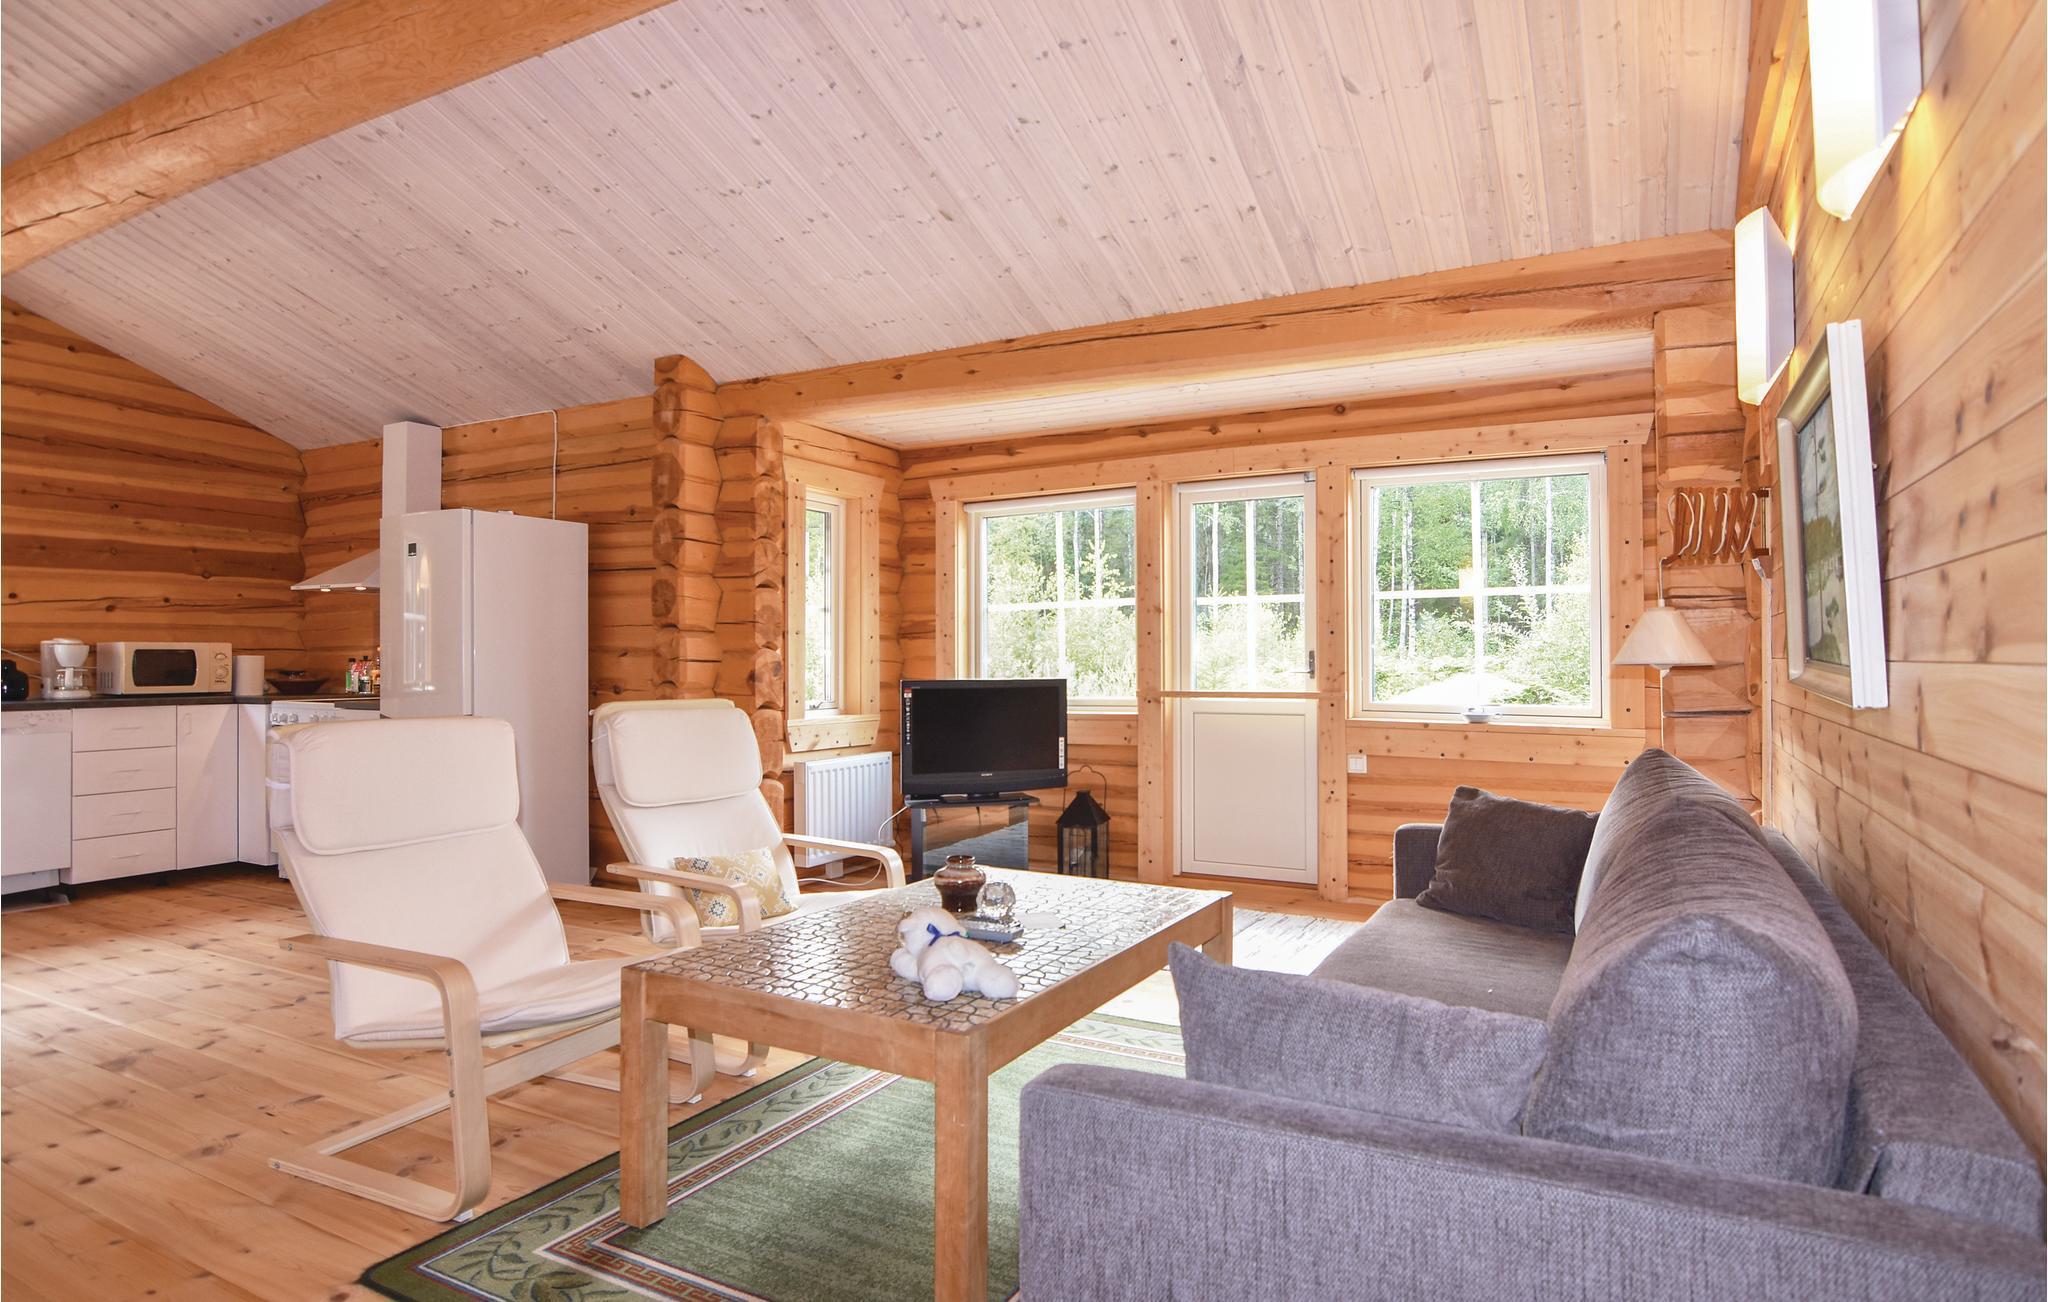 ferienhaus 6 personen fisketj rn grums 664 91 grums 148 s73080 feline holidays. Black Bedroom Furniture Sets. Home Design Ideas